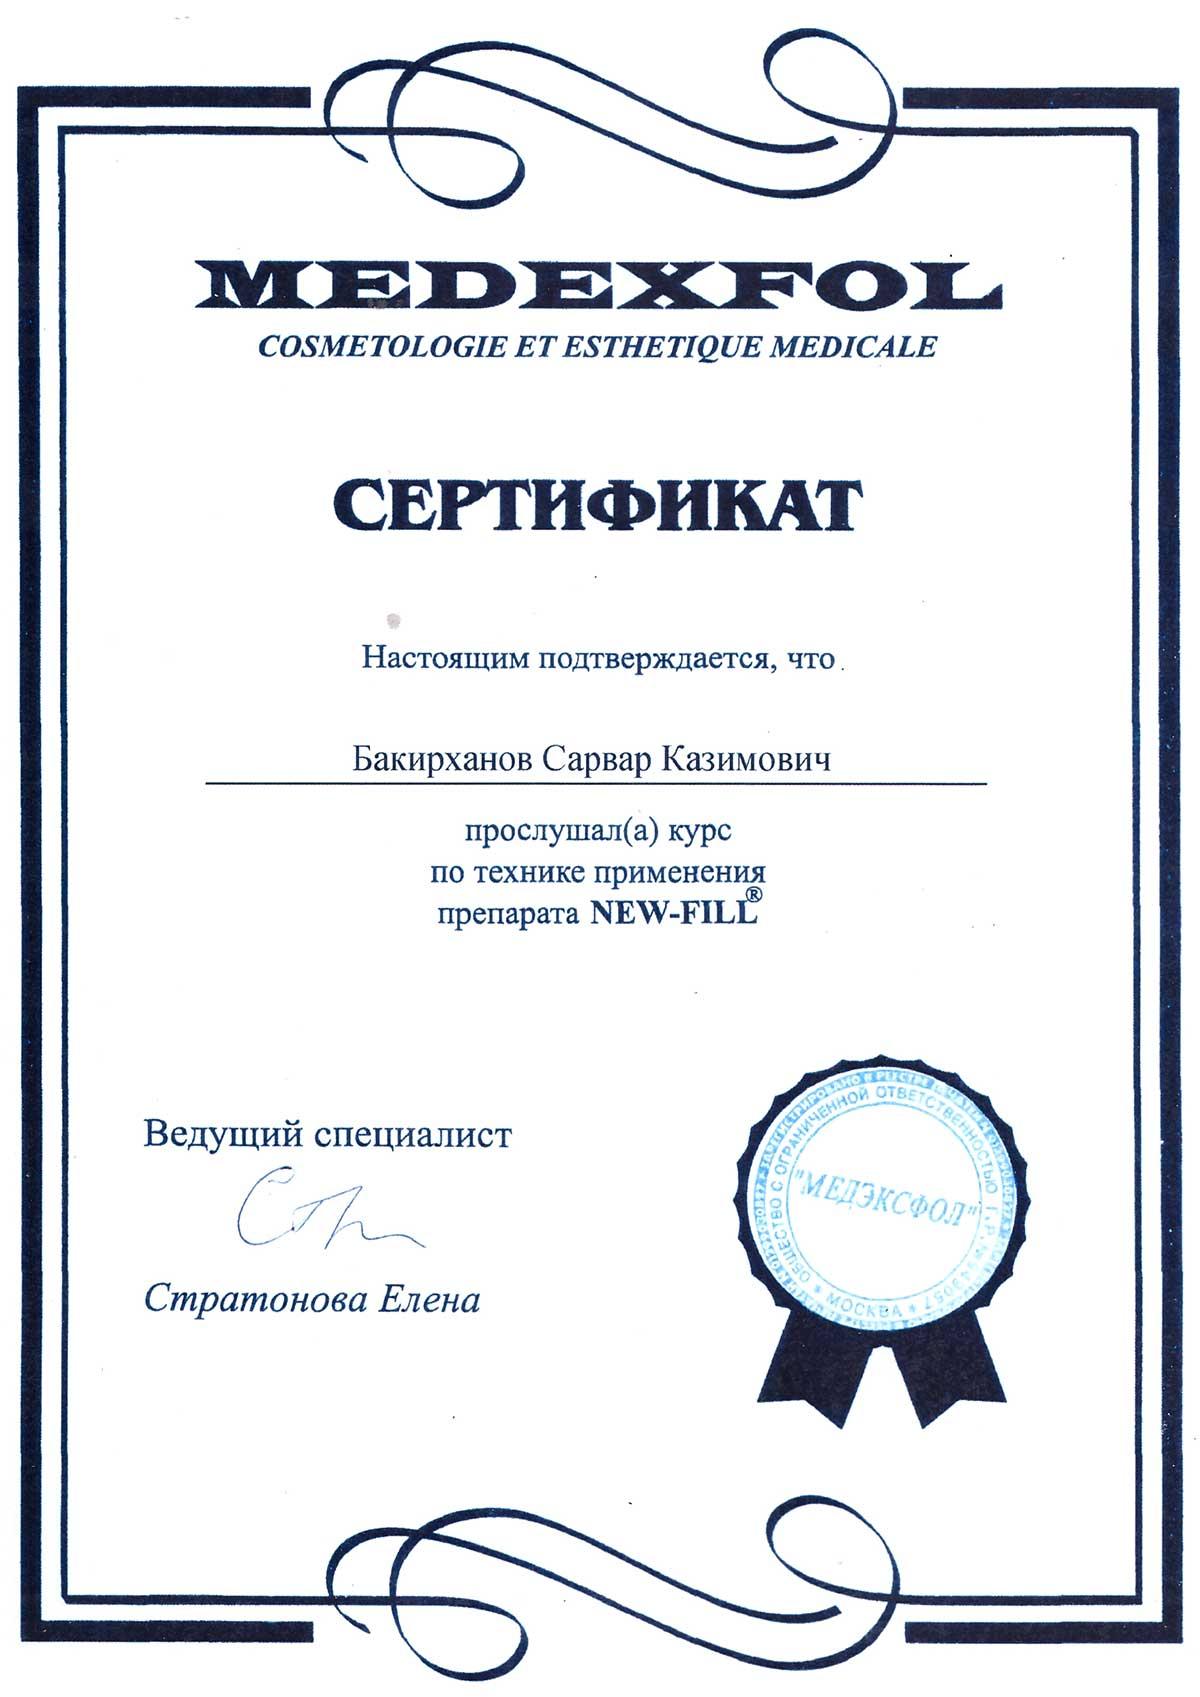 Сертификат о прохождении курса по технике применения препарата NEW-FILL